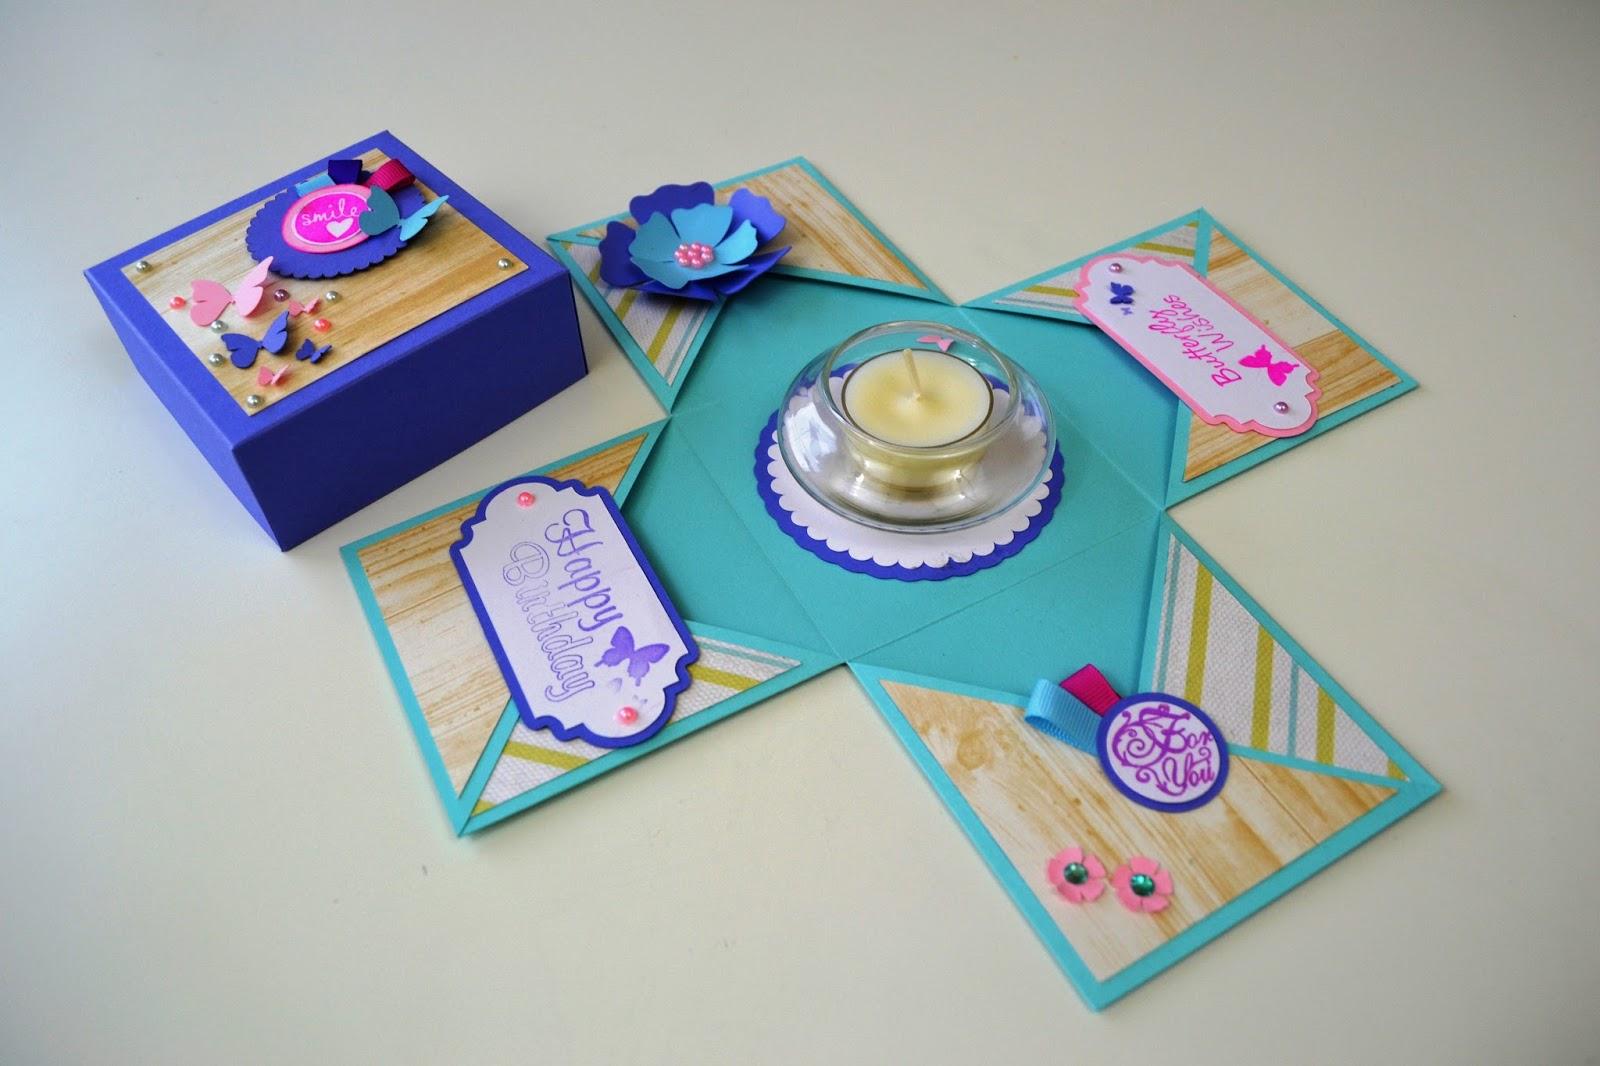 Giulia's Art - DIY Paper Crafts: New Exploding Box model ... - photo#41